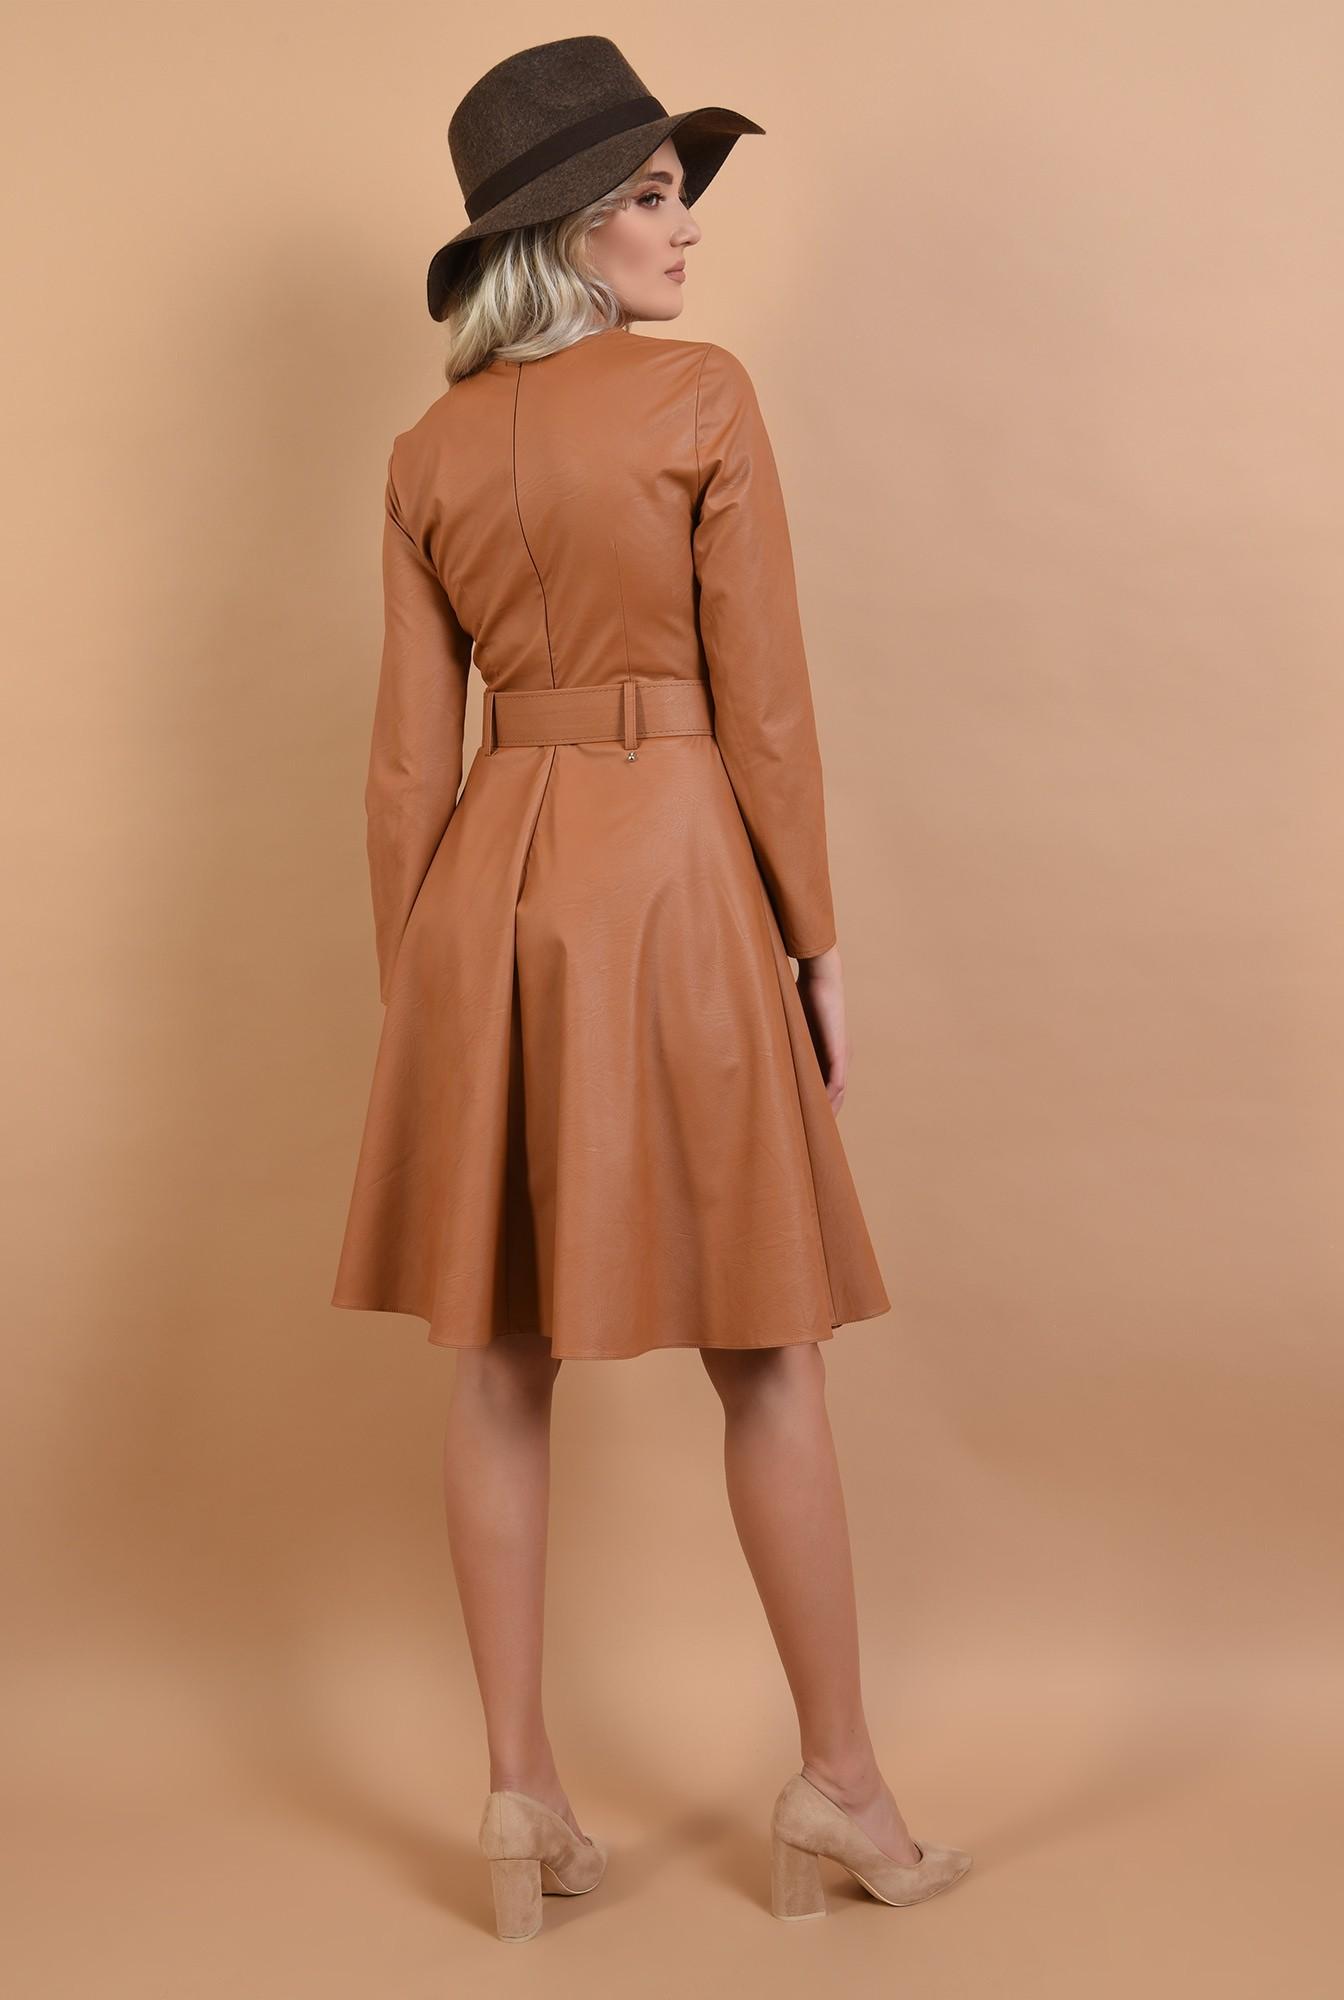 1 - rochie Poema, din piele, evazata, cu centura, midi